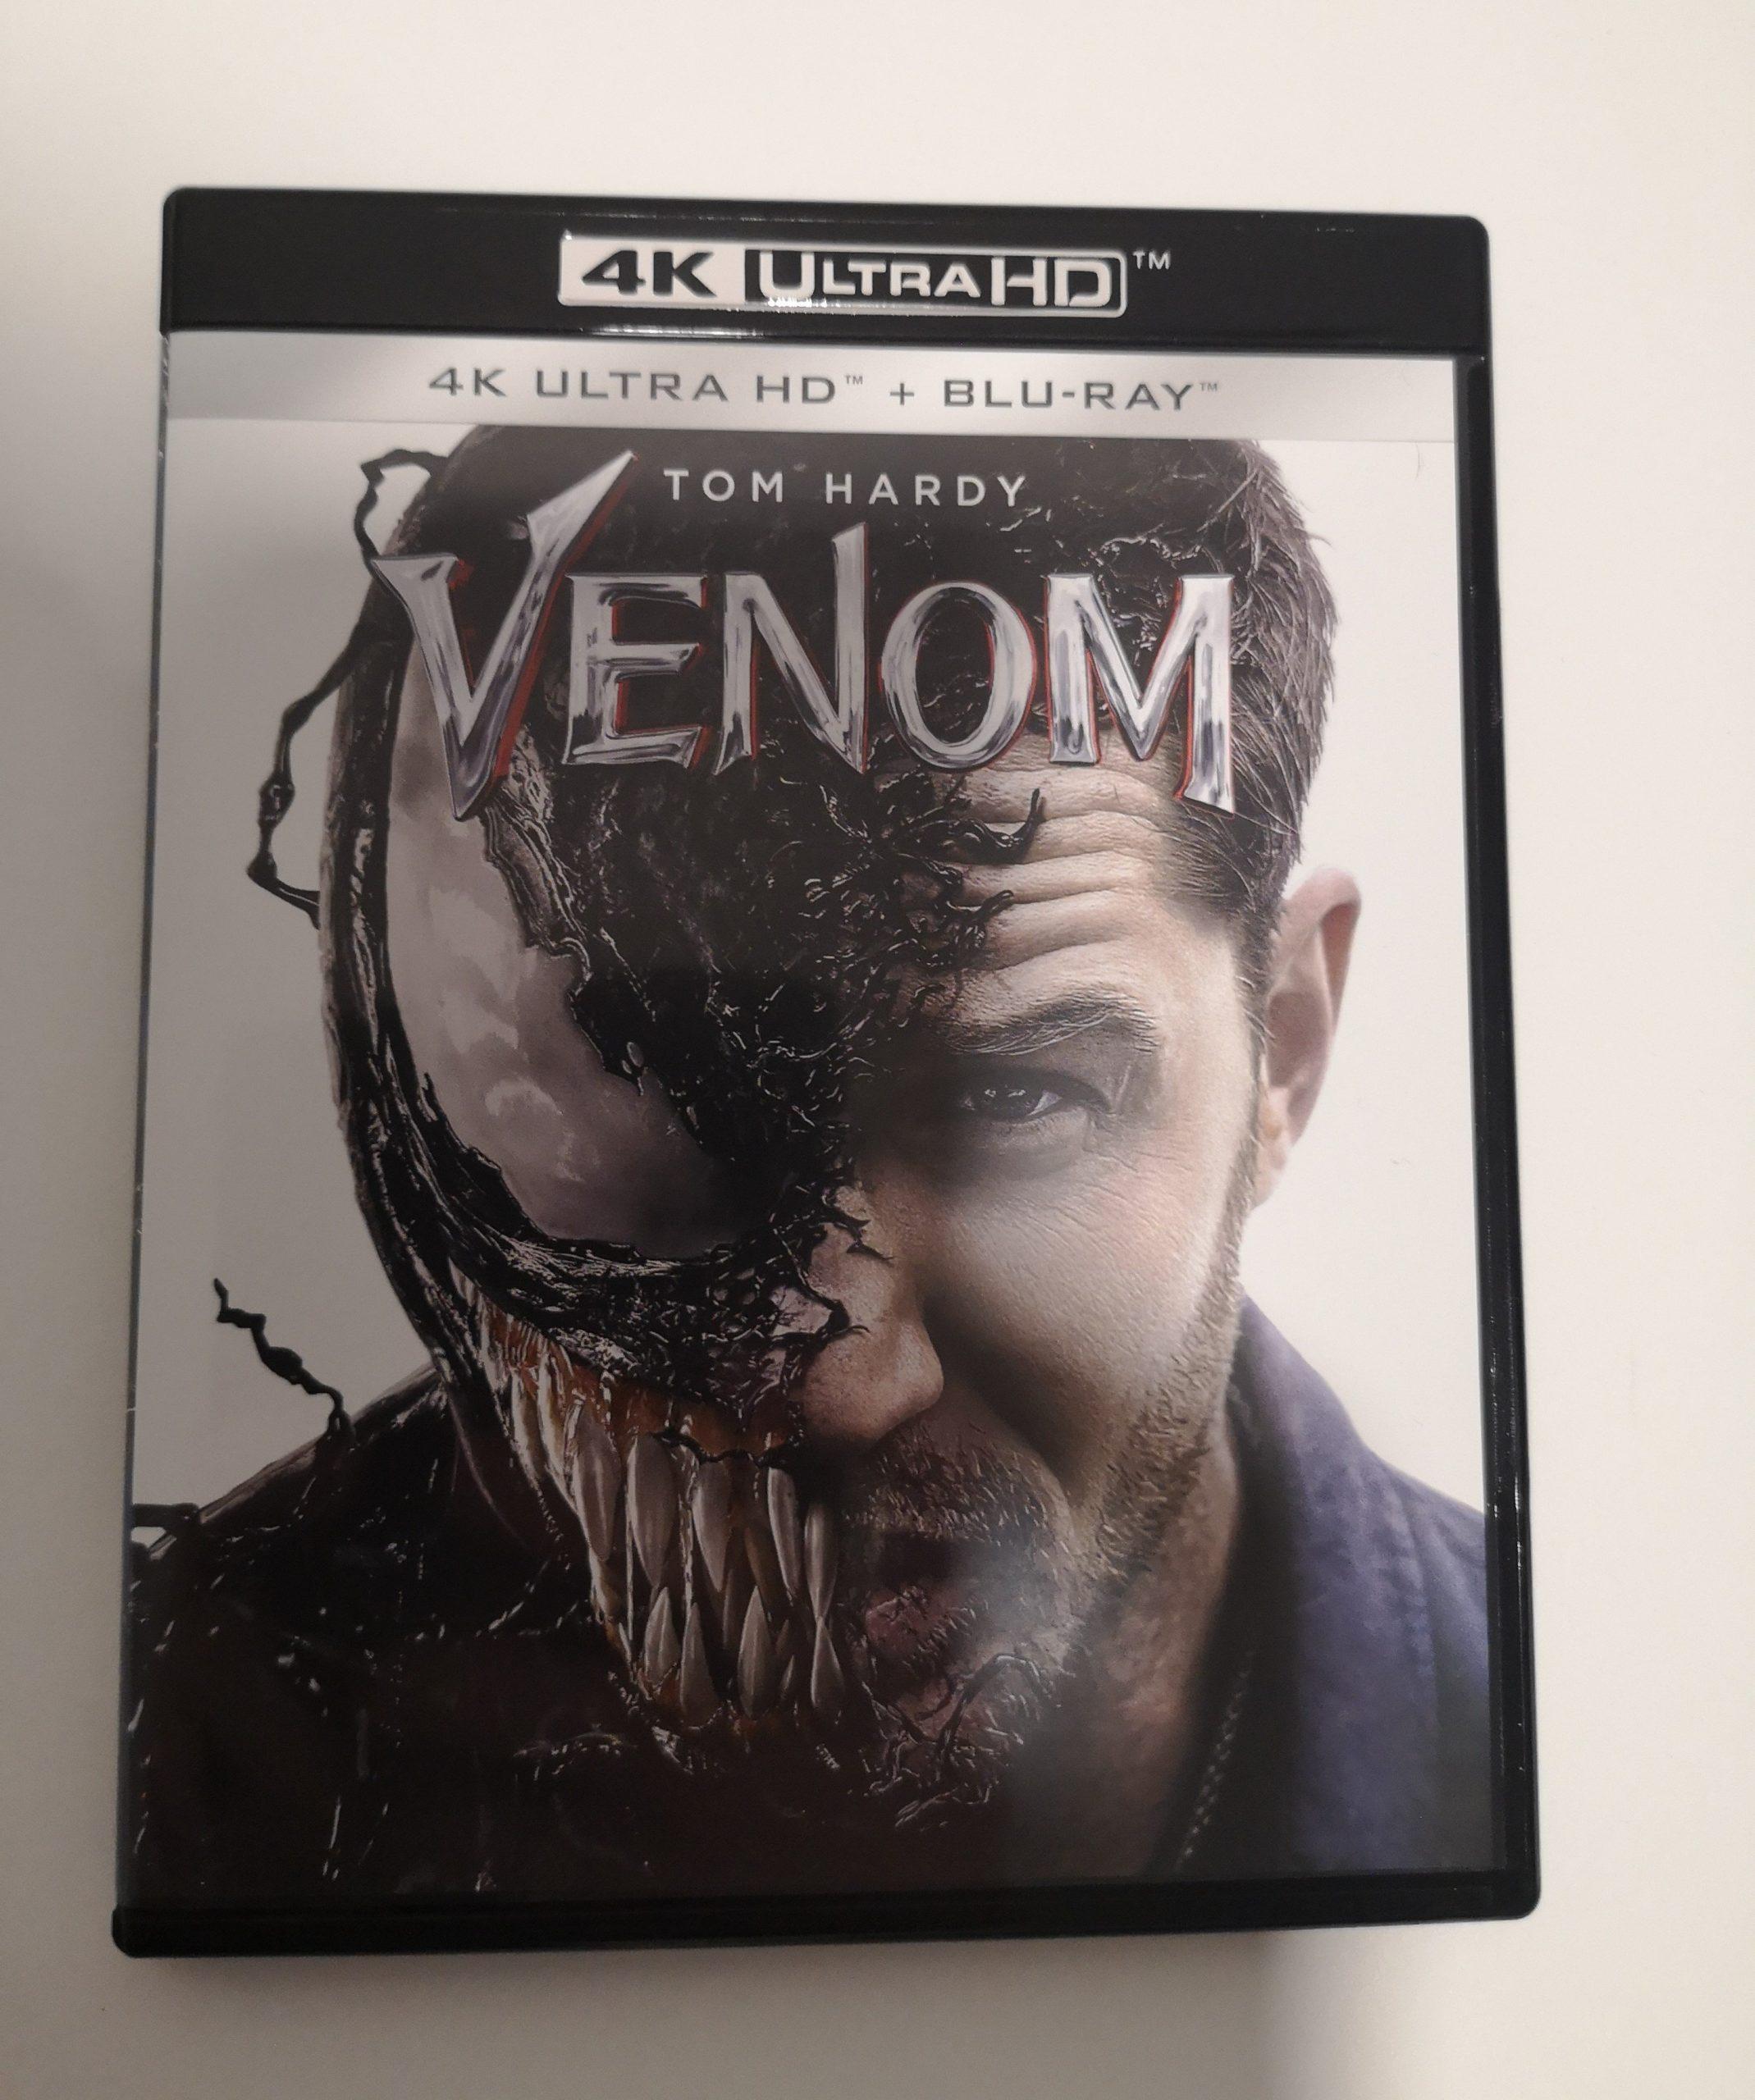 Venom portada 4K